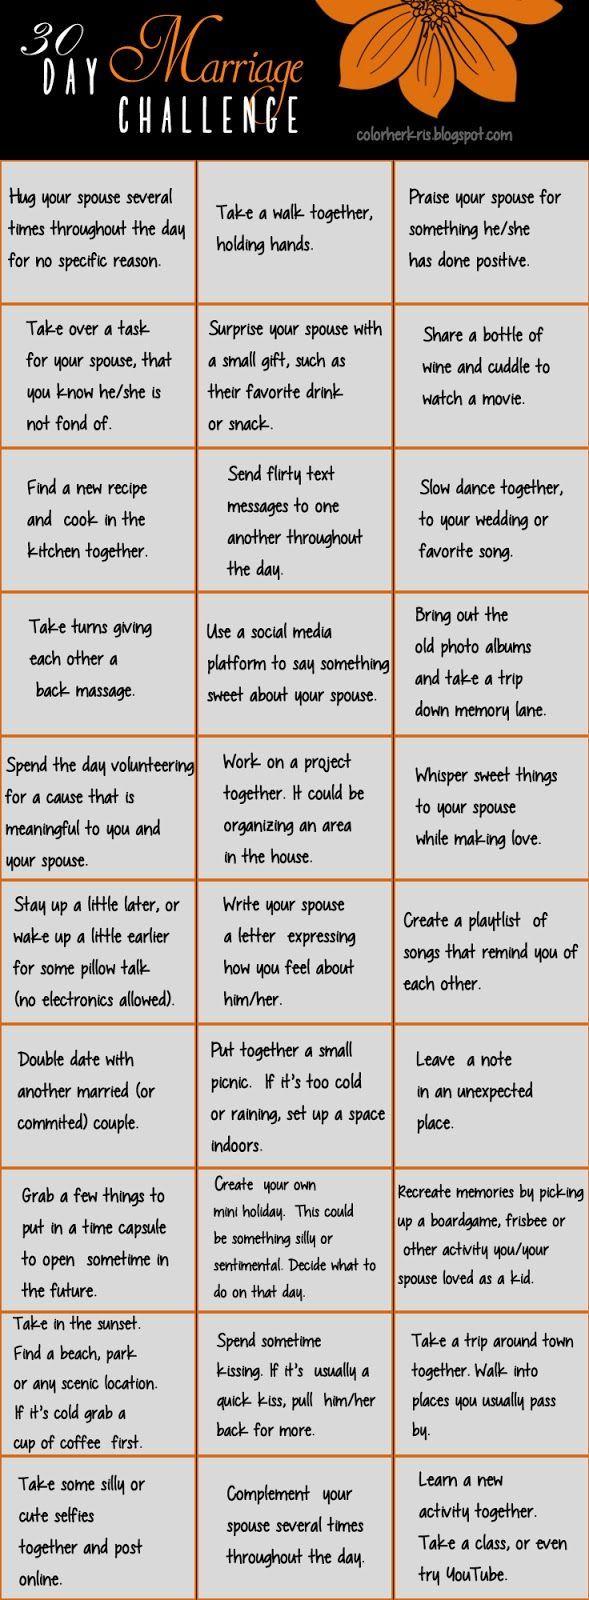 30 Day Marriage Challenge | Love & Fun Gooshy Stuff | Marriage